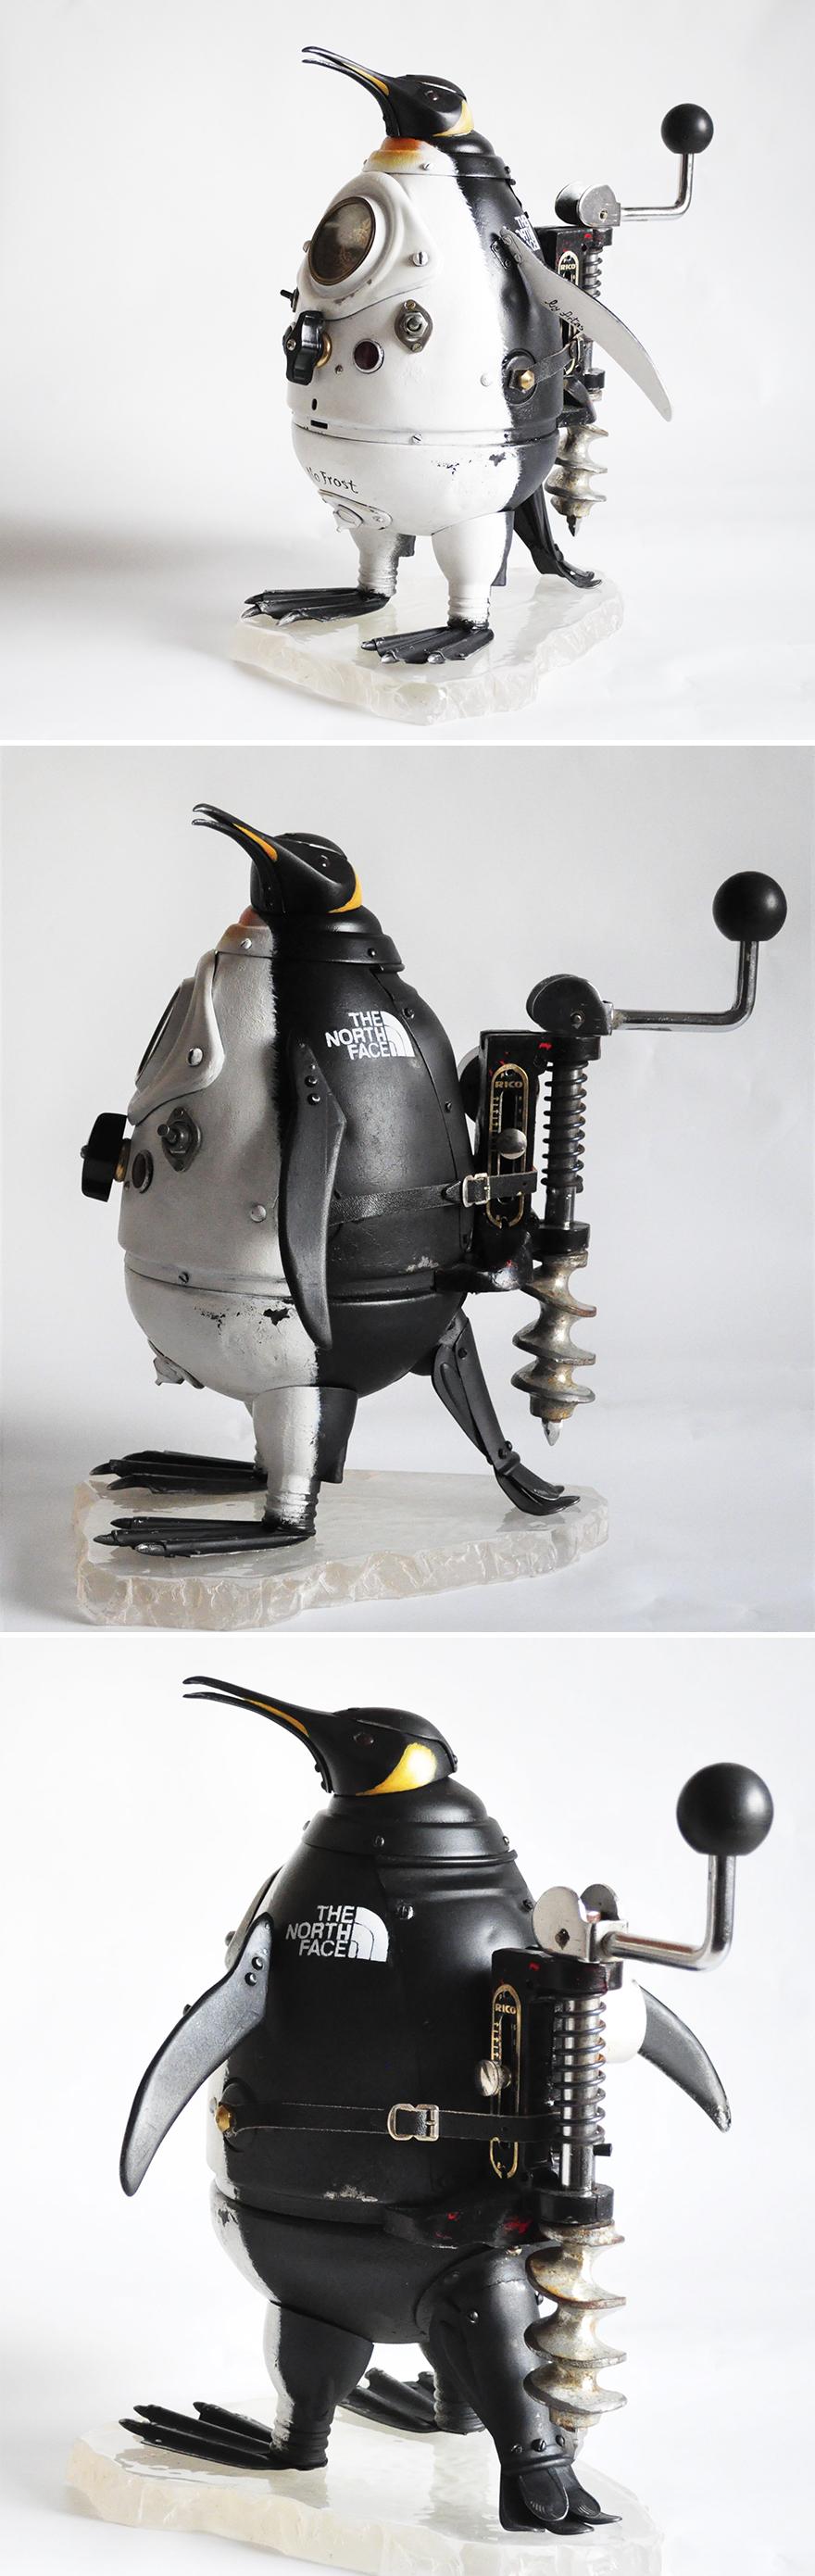 my-steampunk-sculptures-58ef39c5e5f38__880-1